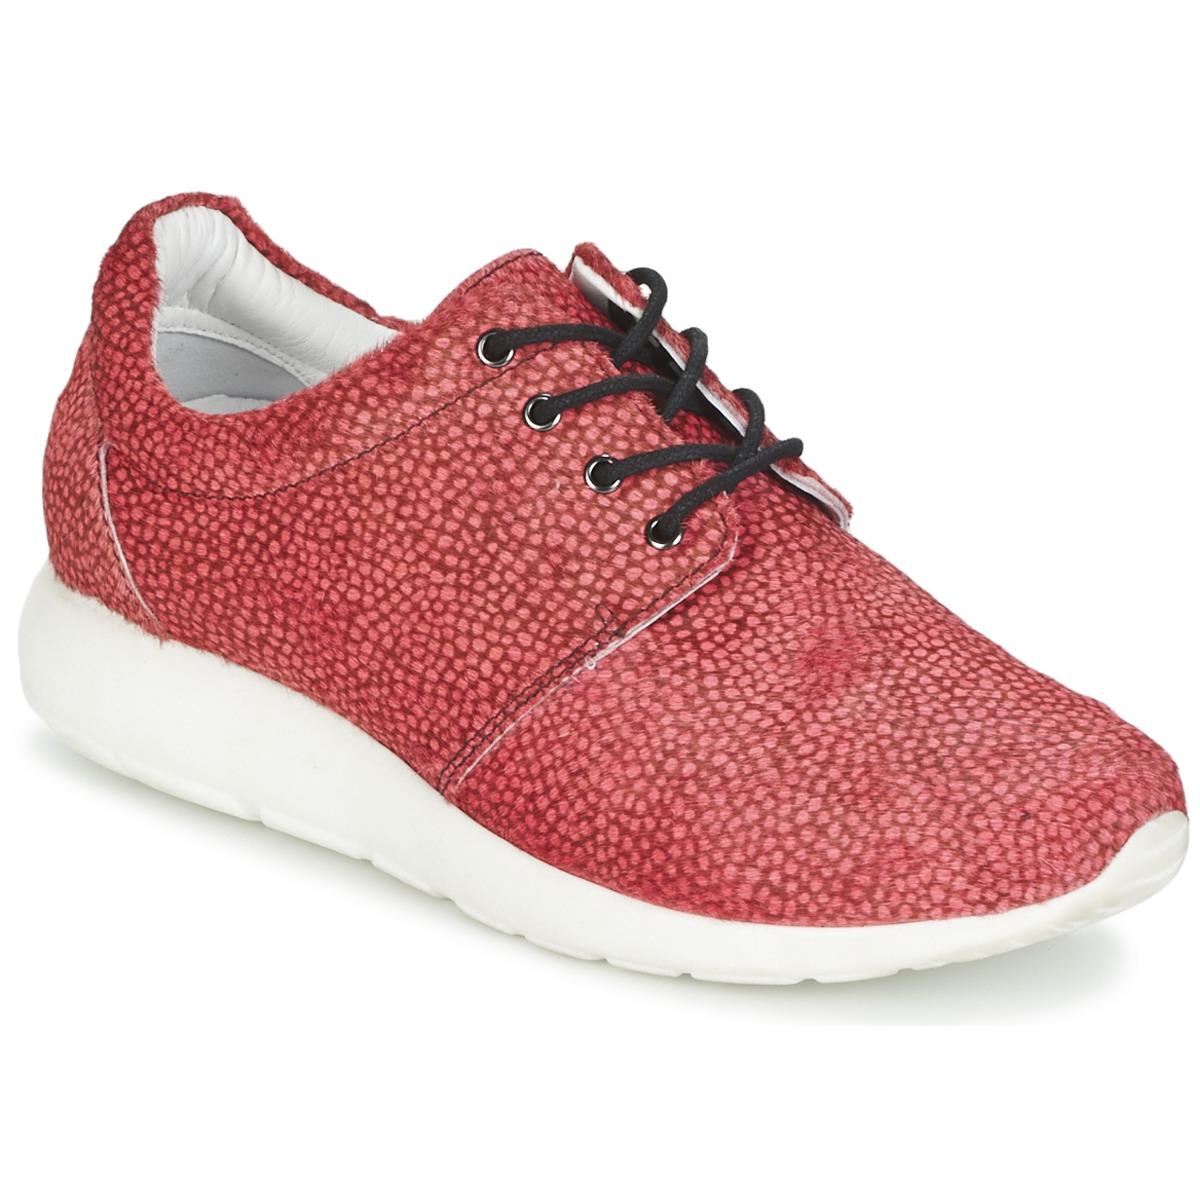 Maruti WING Rot - Kostenloser Versand bei Spartoode ! - Schuhe Sneaker Low Damen 55,00 €